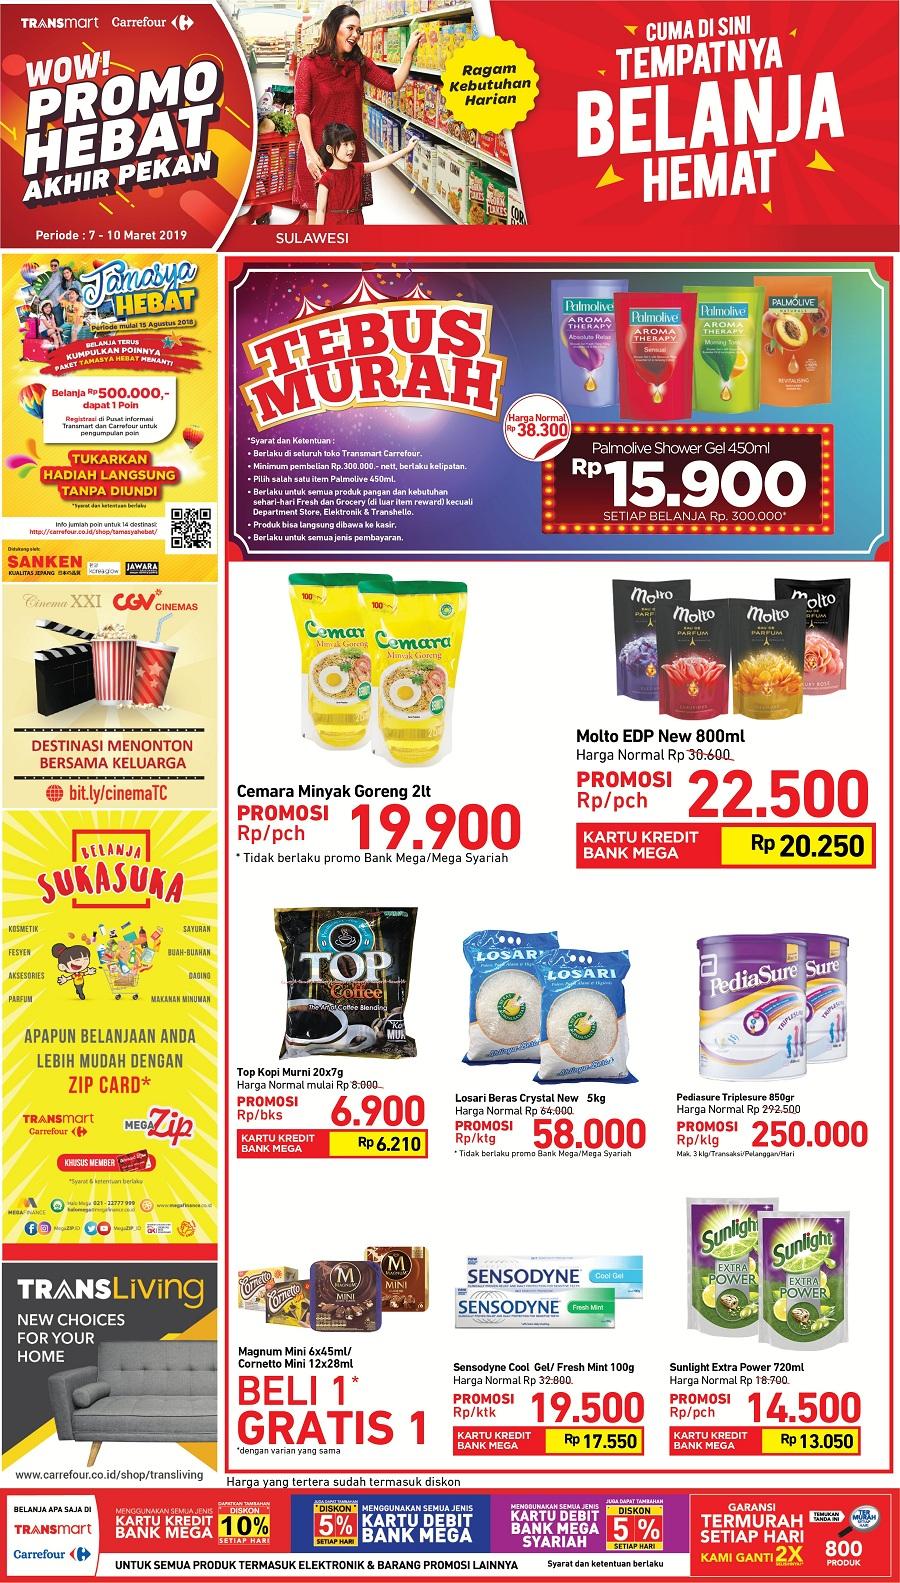 #Transmart #Carrefour - #Promo #Katalog Akhir Pekan Periode 07 - 10 Maret 2019